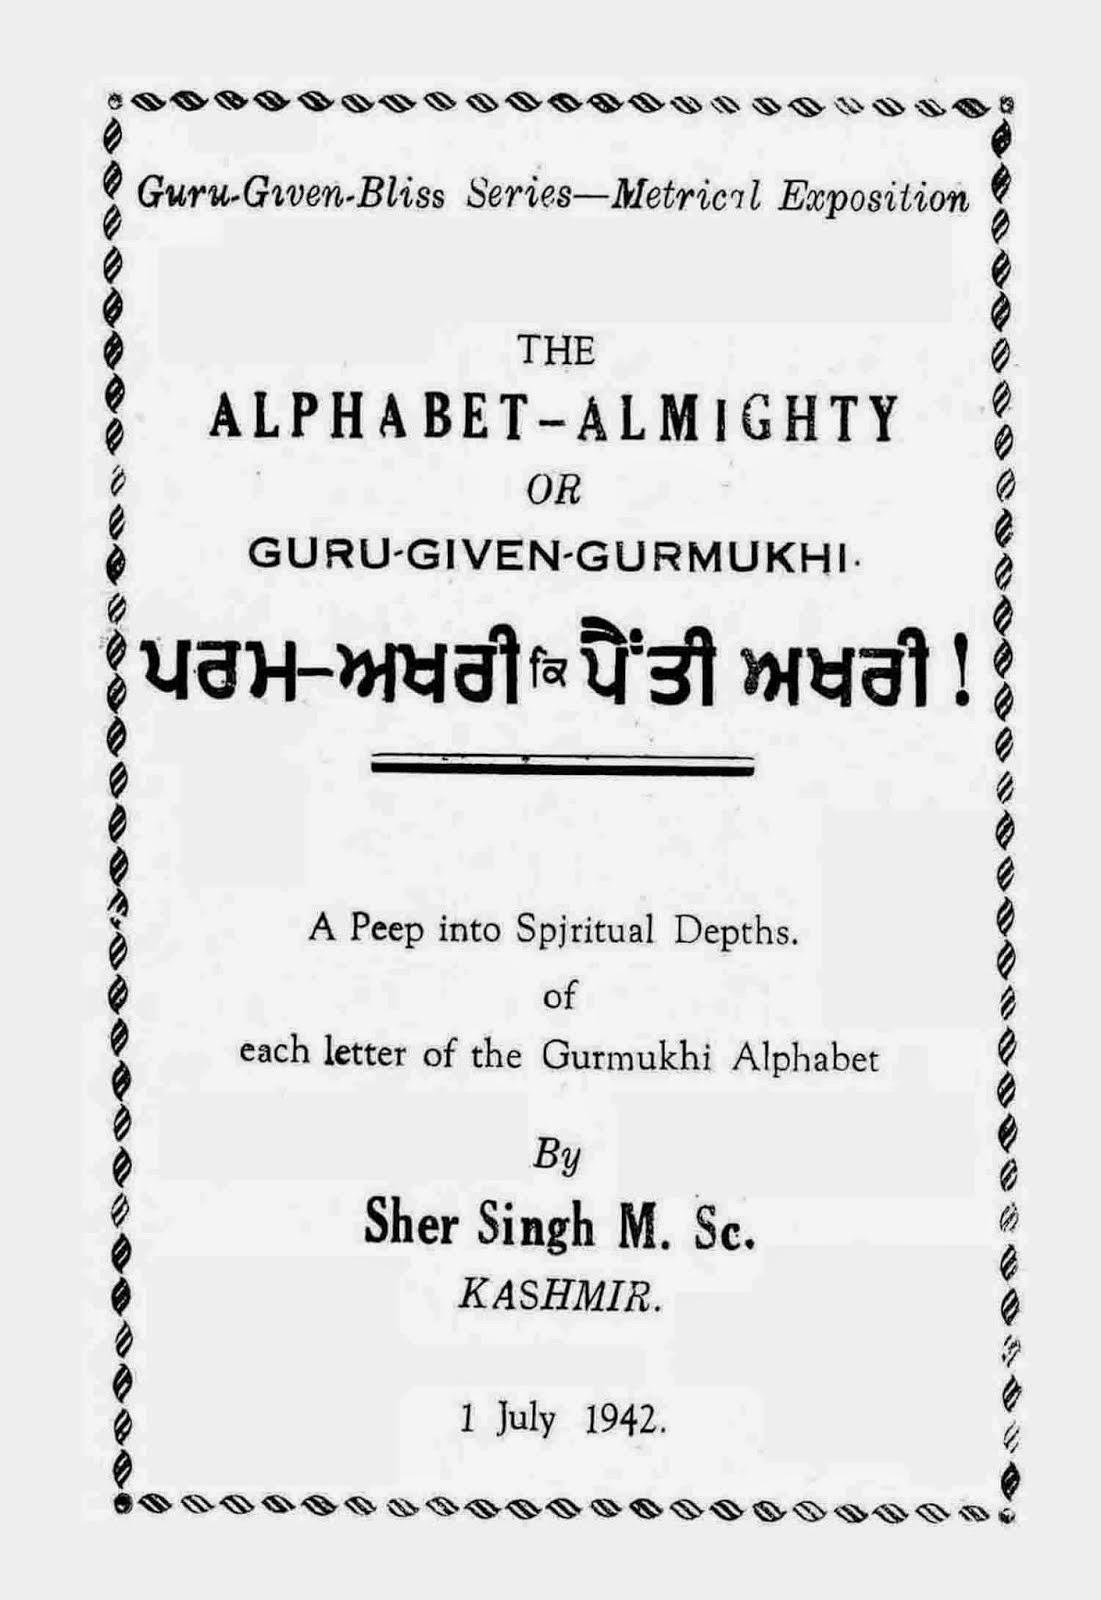 Sikh digital library celebrating the life and works of bhai sahib sikh digital library celebrating the life and works of bhai sahib bhai sher singh msc kashmir fandeluxe Images